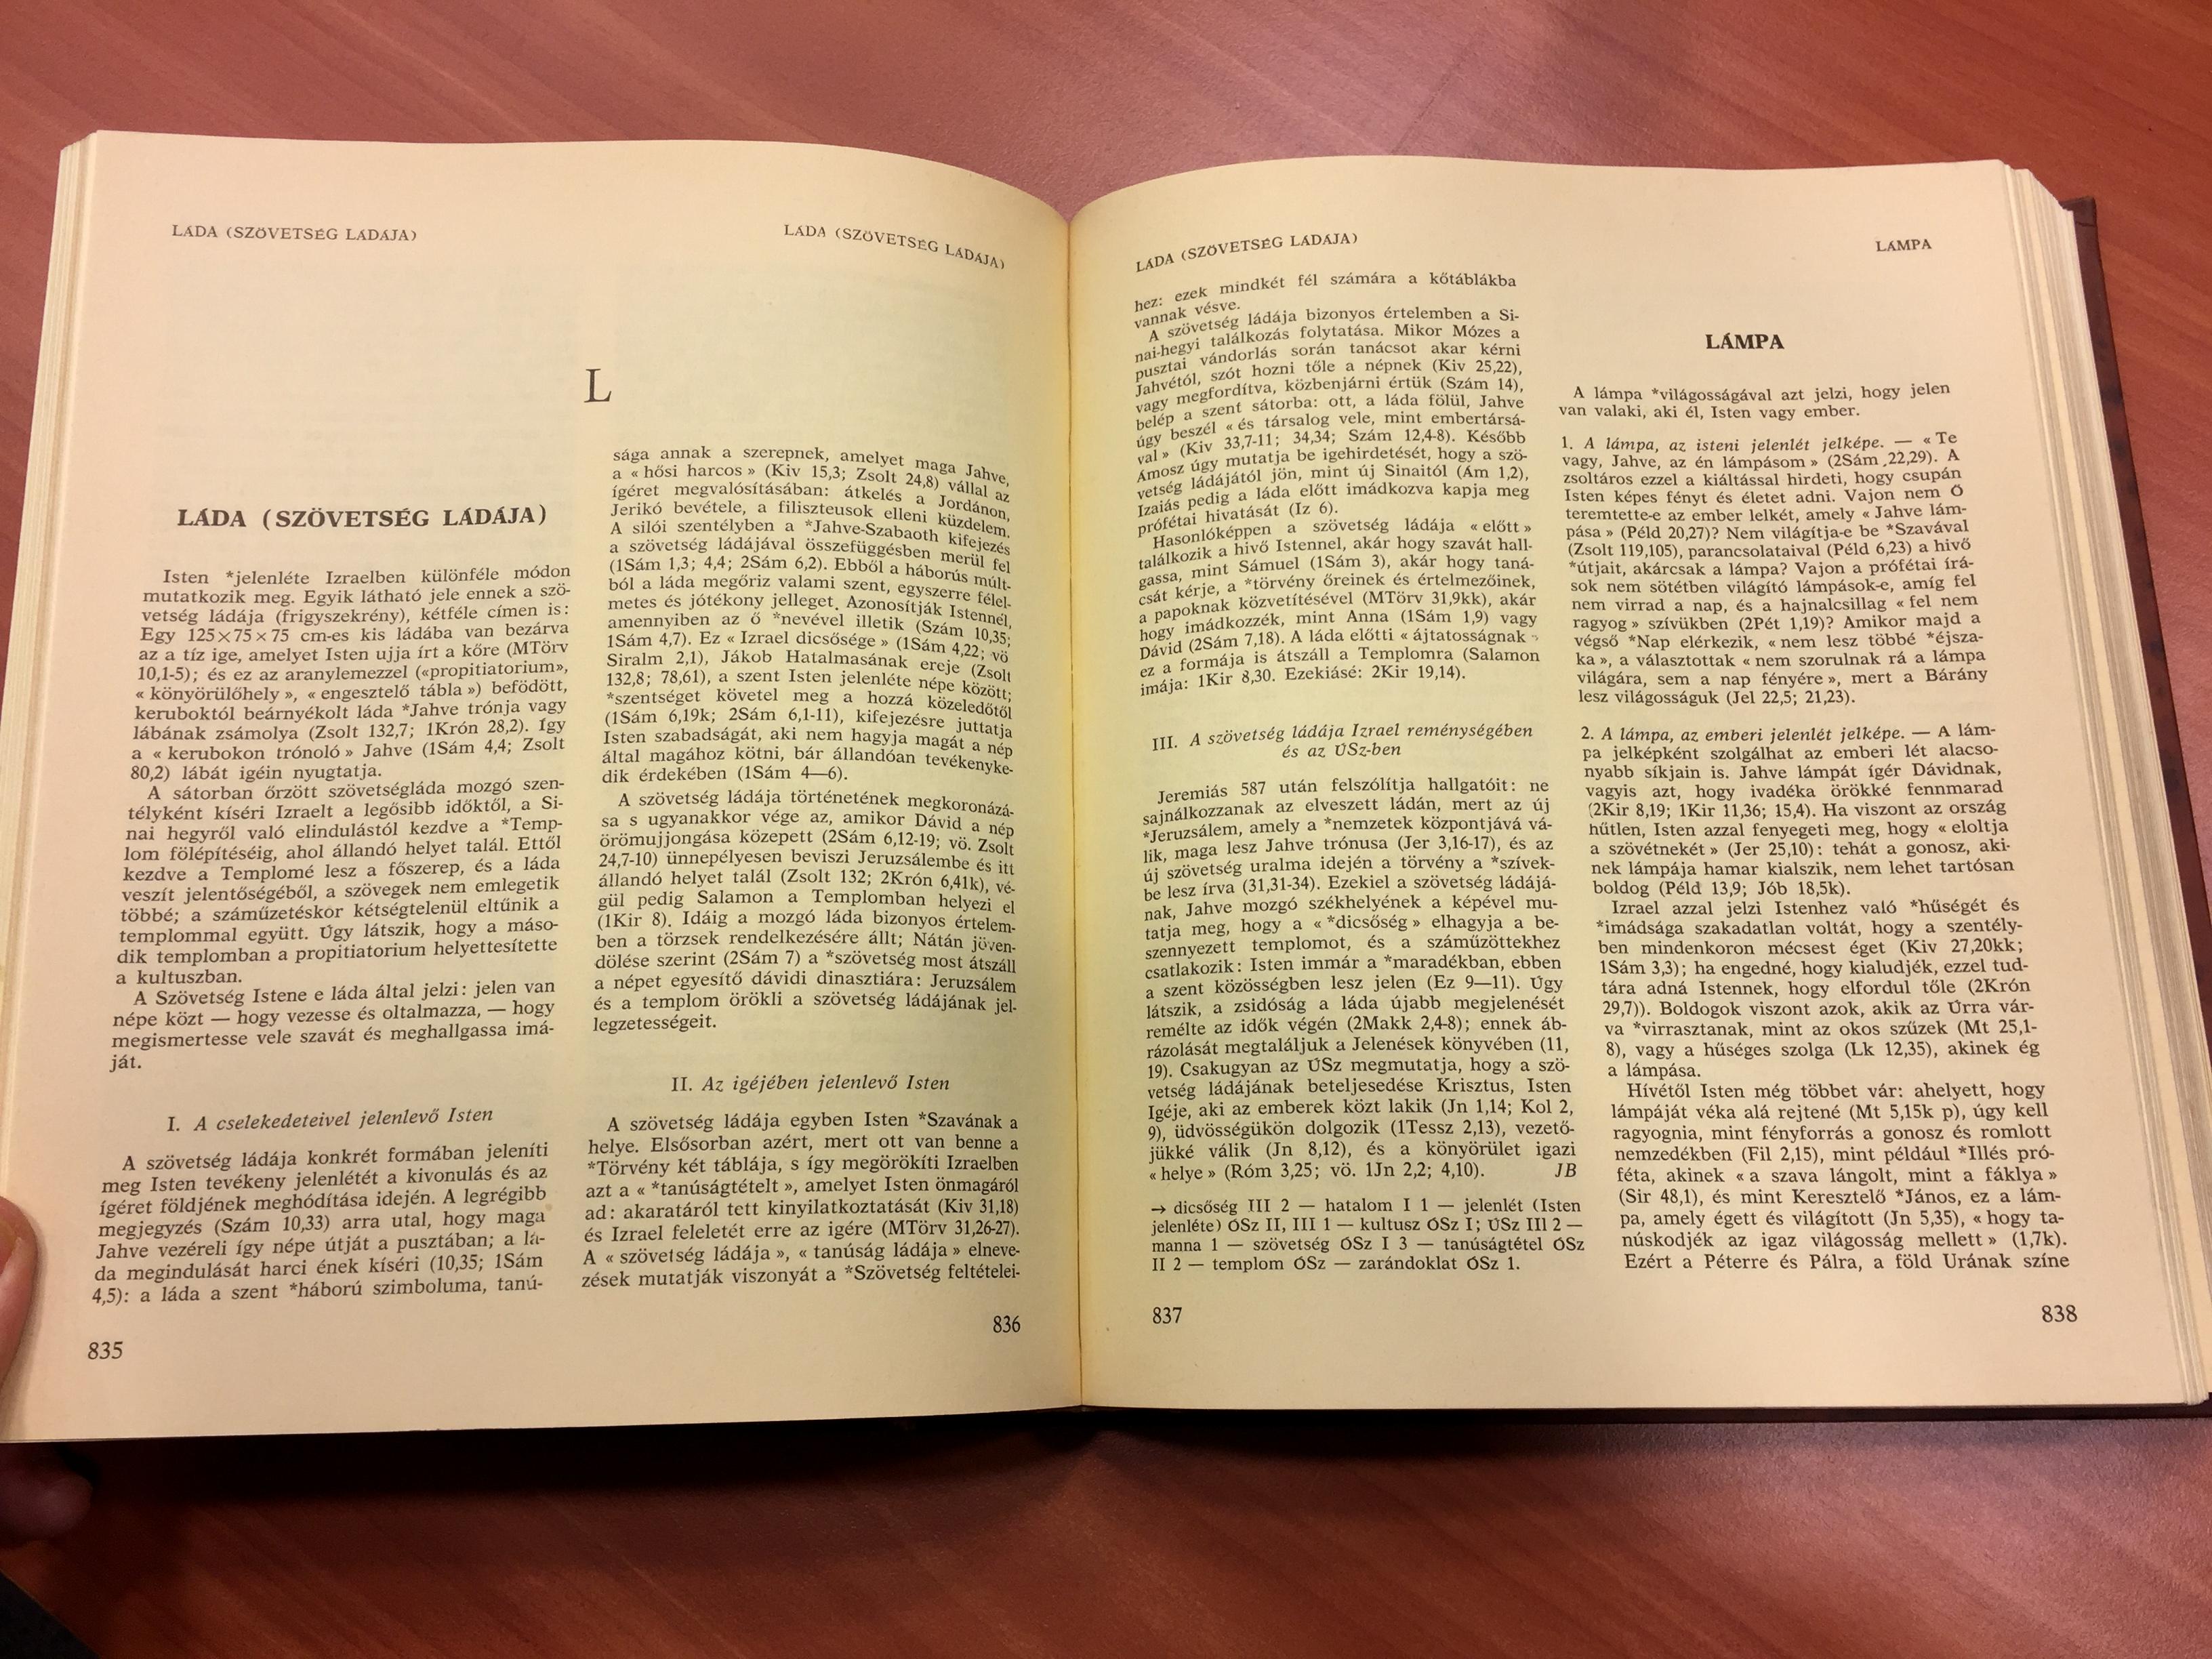 biblikus-teol-giai-sz-t-r-biblical-theology-dictionary-vocabulaire-de-th-ologie-biblique-szent-istv-n-t-rsulat-hardcover-1992-8-.jpg